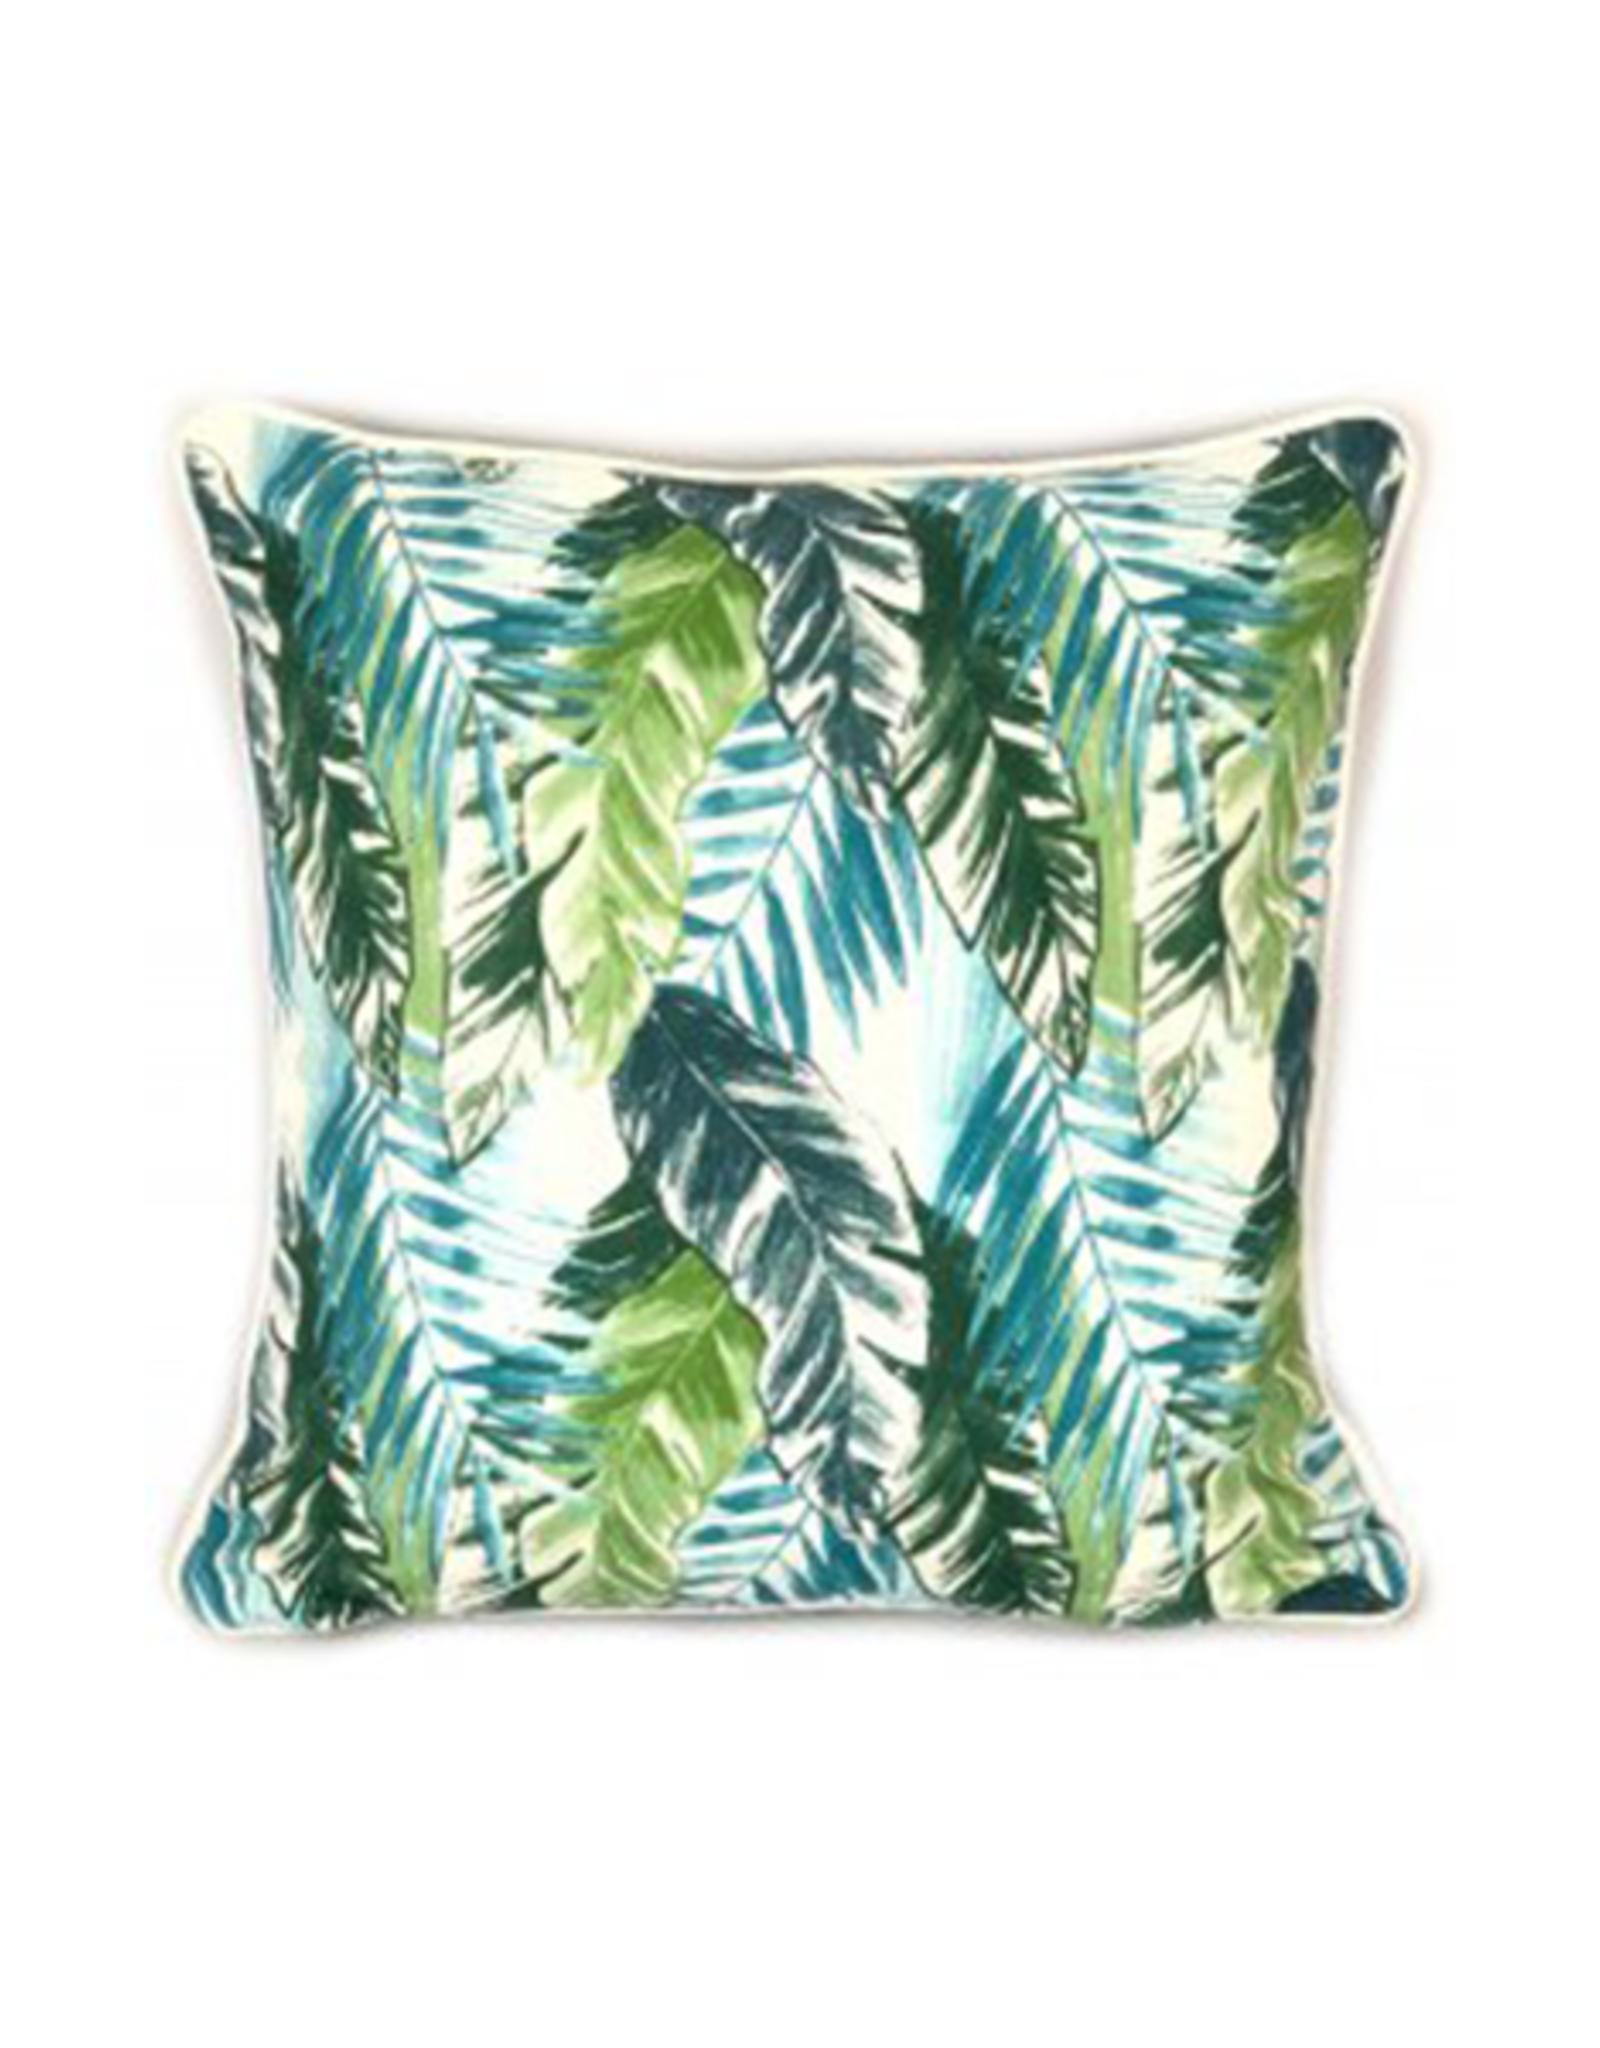 Craft Studio Forest Foliage Cushion Cover 40x40cm